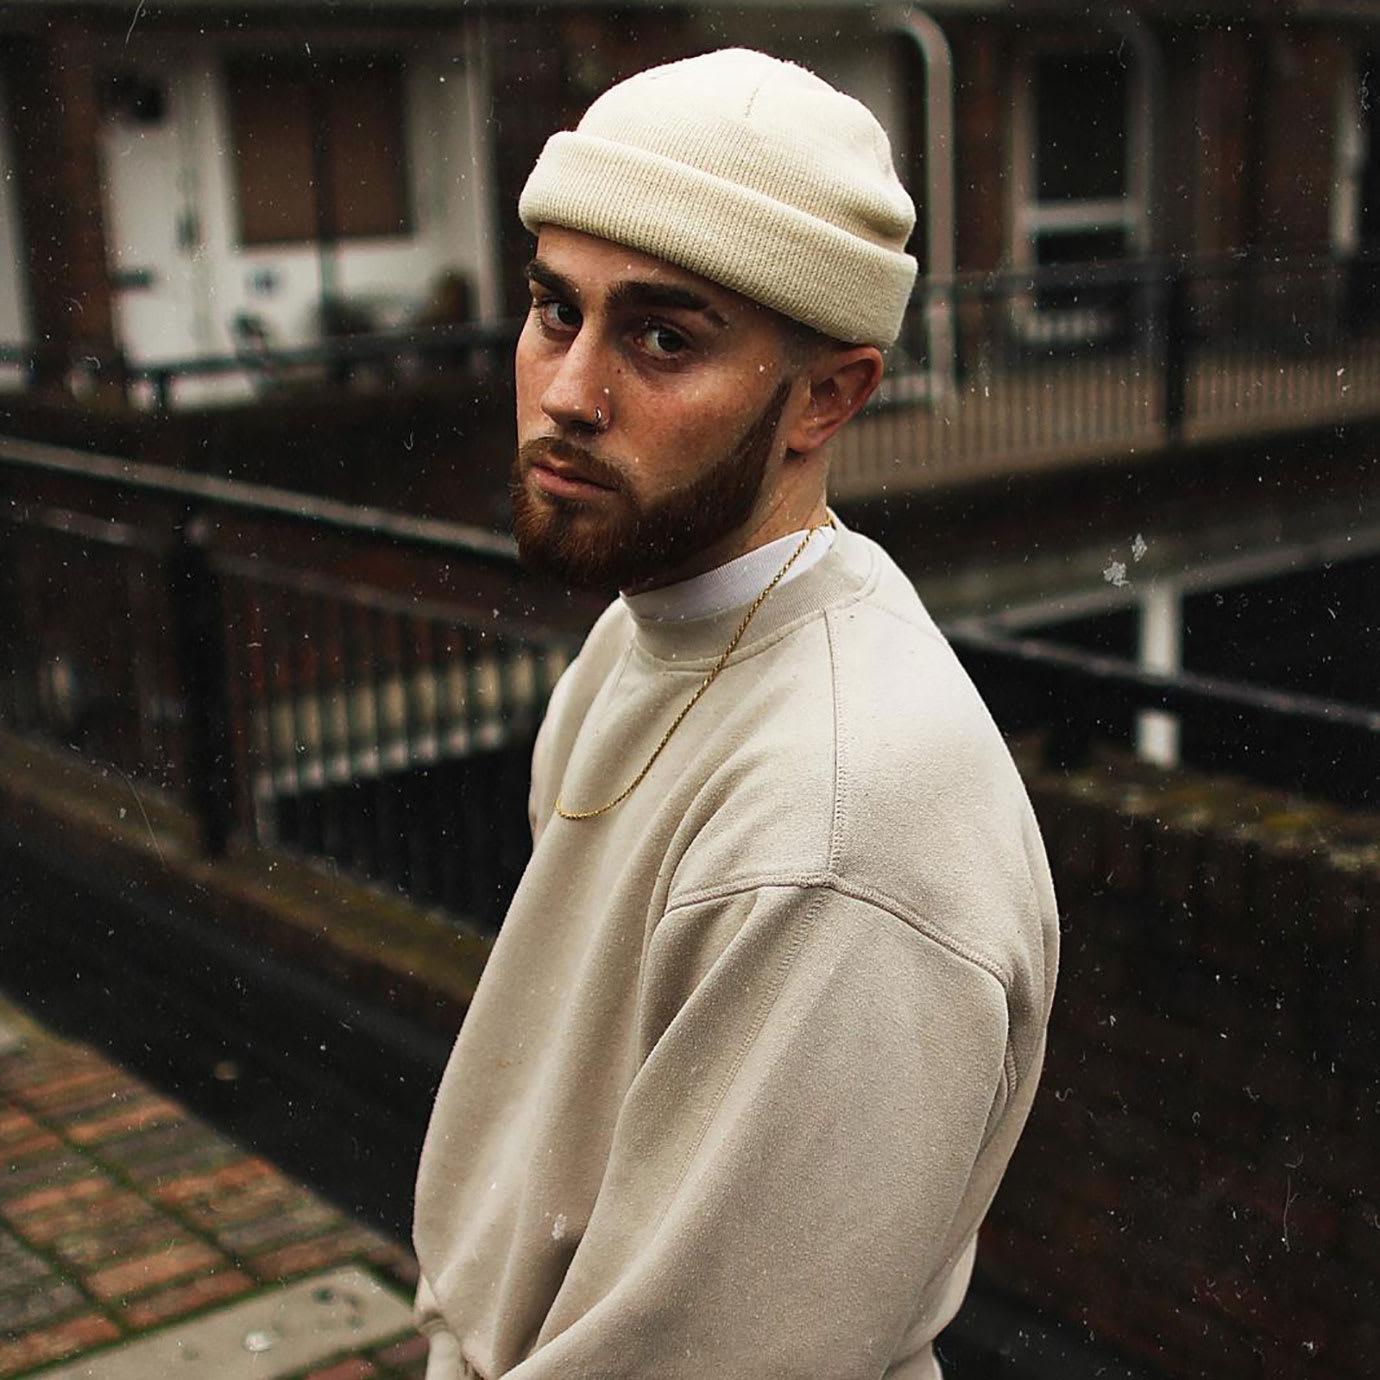 A man with a beard standing on an urban walkway.